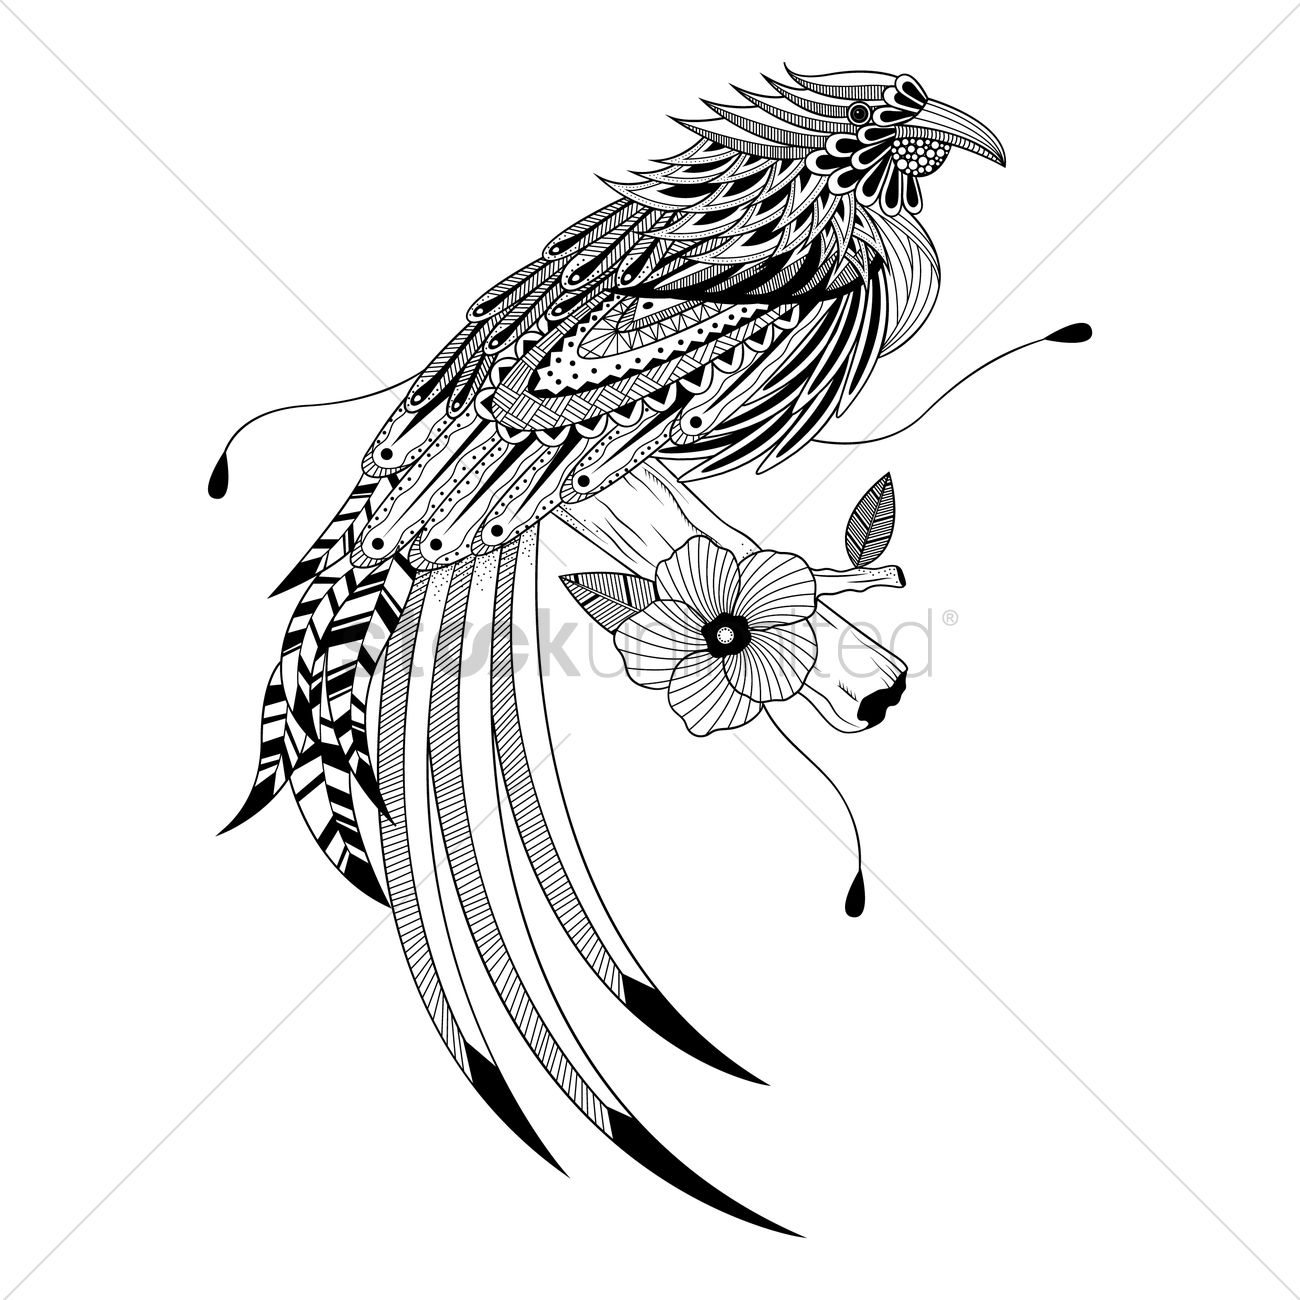 1300x1300 Intricate Bird Design Vector Image